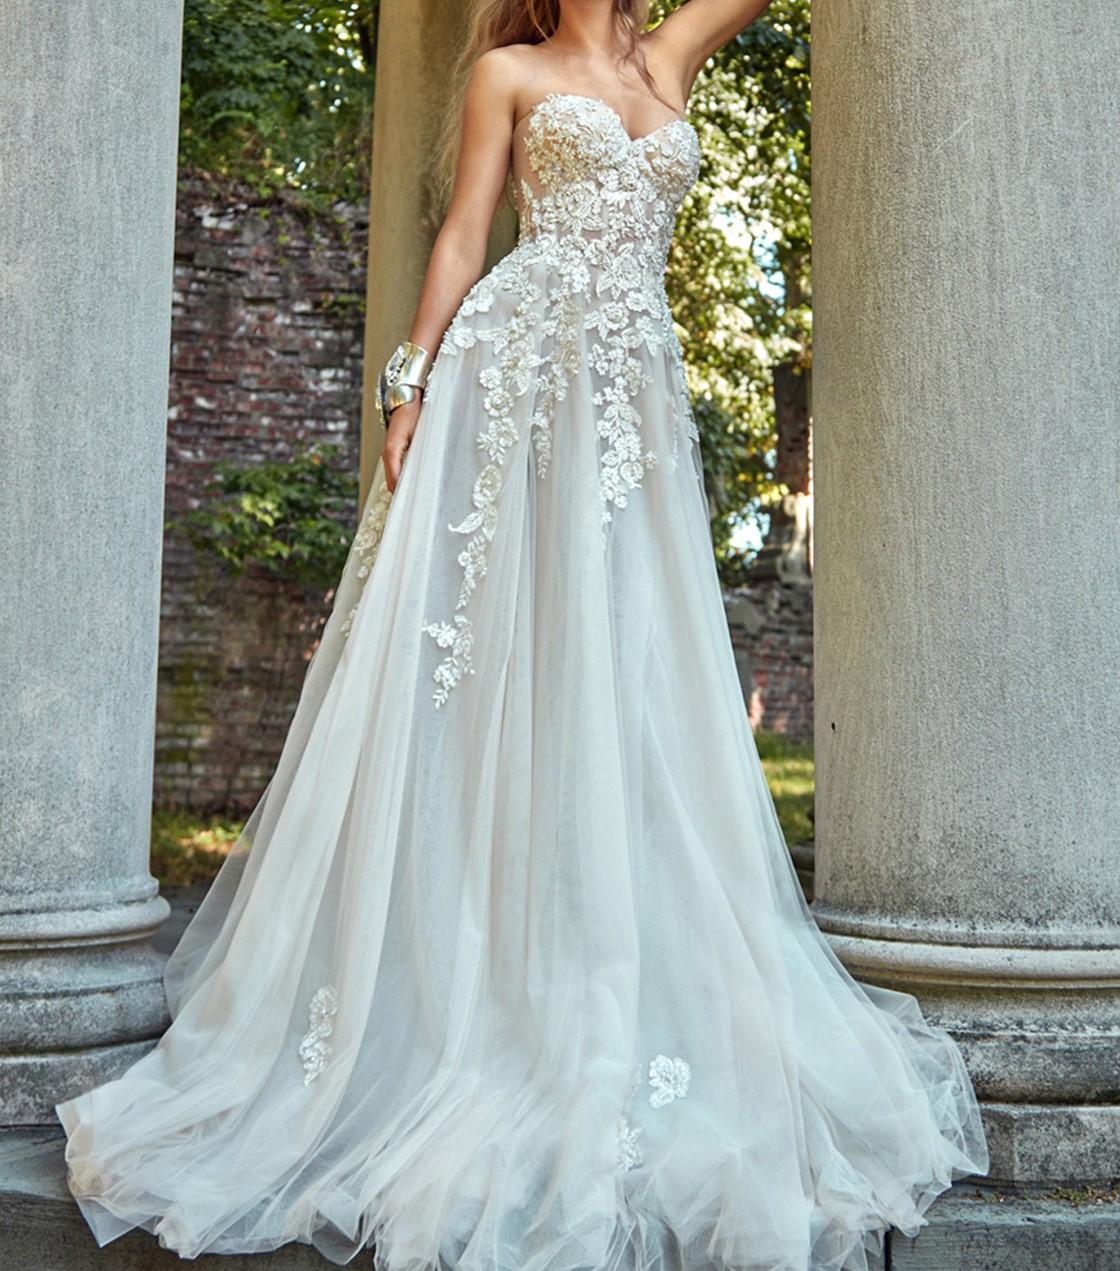 Galia Lahav Gia Preowned Wedding Dress On Sale 47% Off